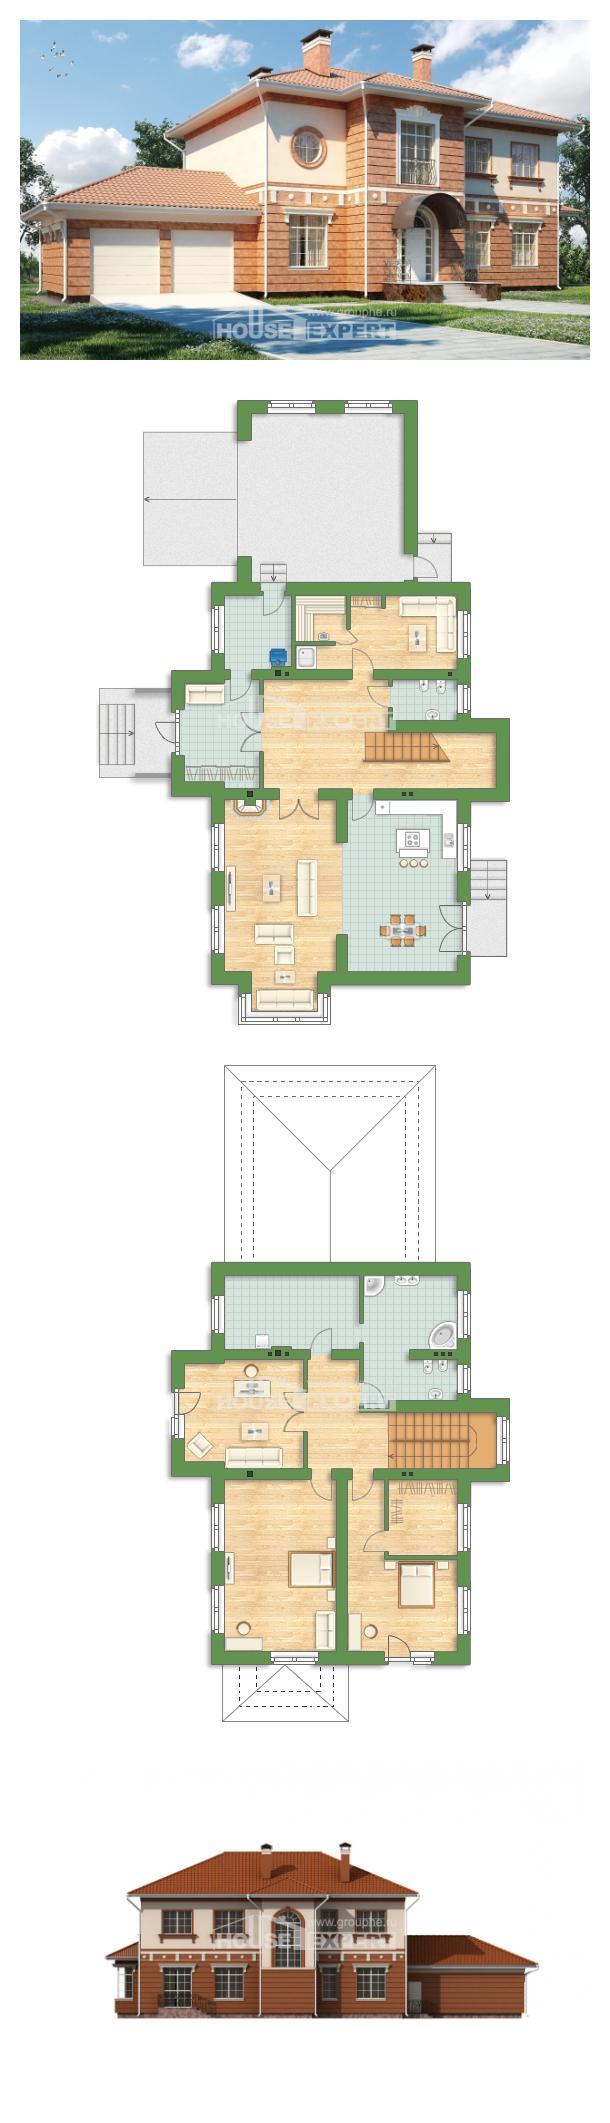 Projekt domu 285-001-L | House Expert